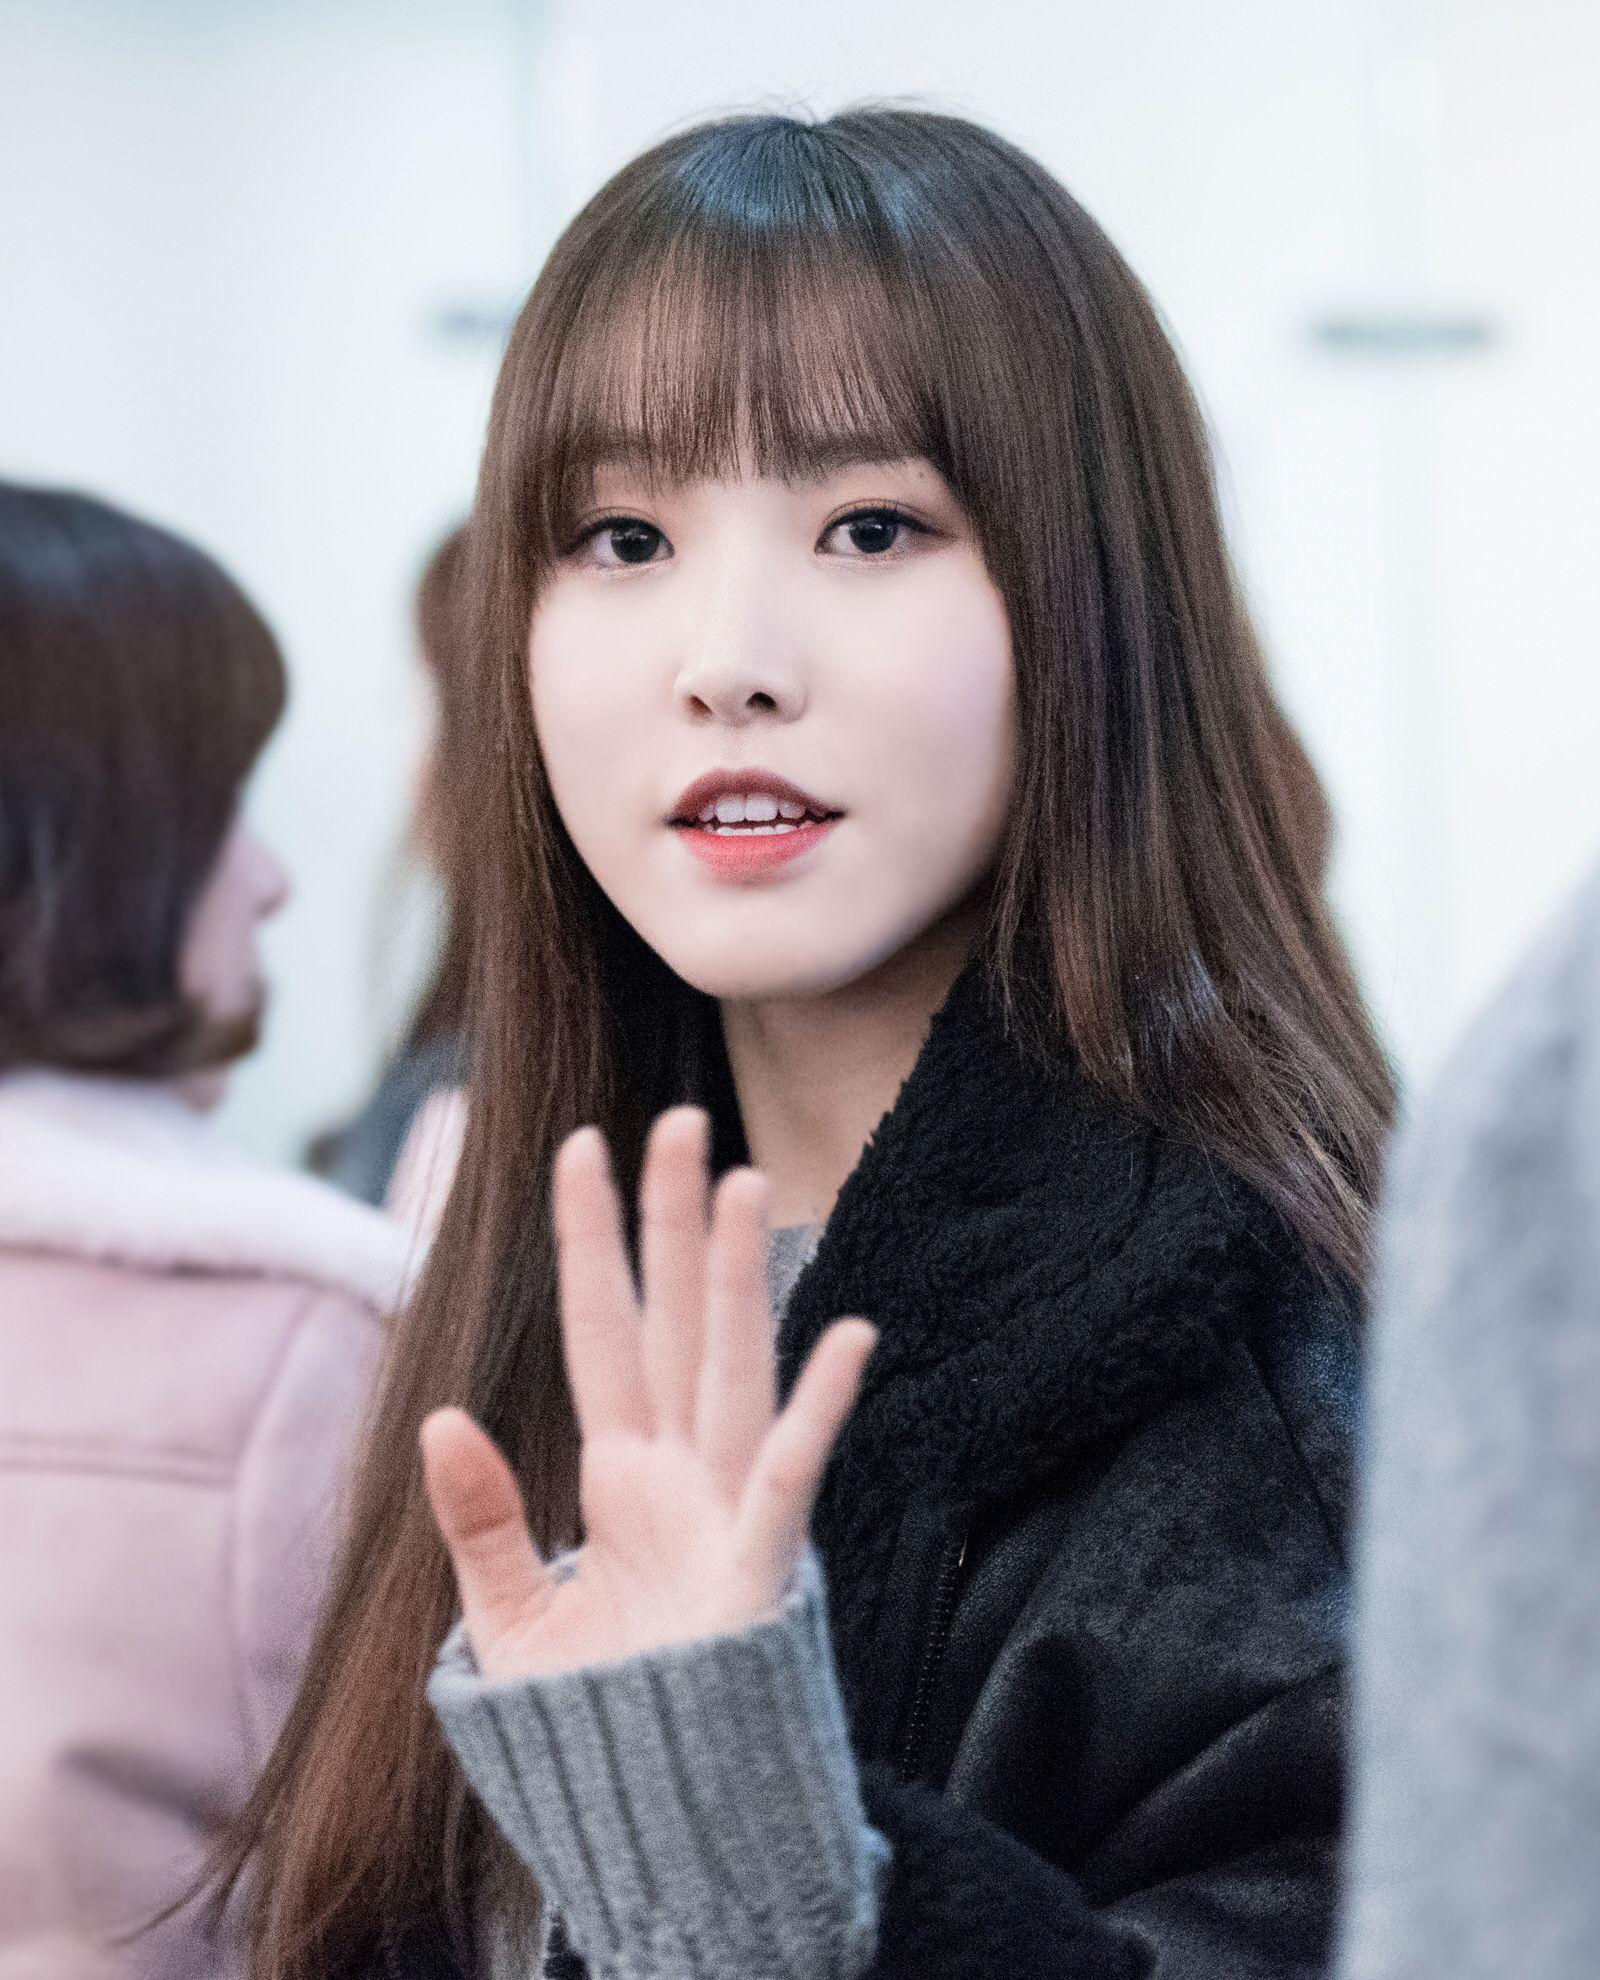 Girlfriend Yuju Has Photo Time Super Star Philko Korean Dress Korea Philippine Korea Shopee Korean Fashion Shopee Gfriend Yuju Superstar Love Heart